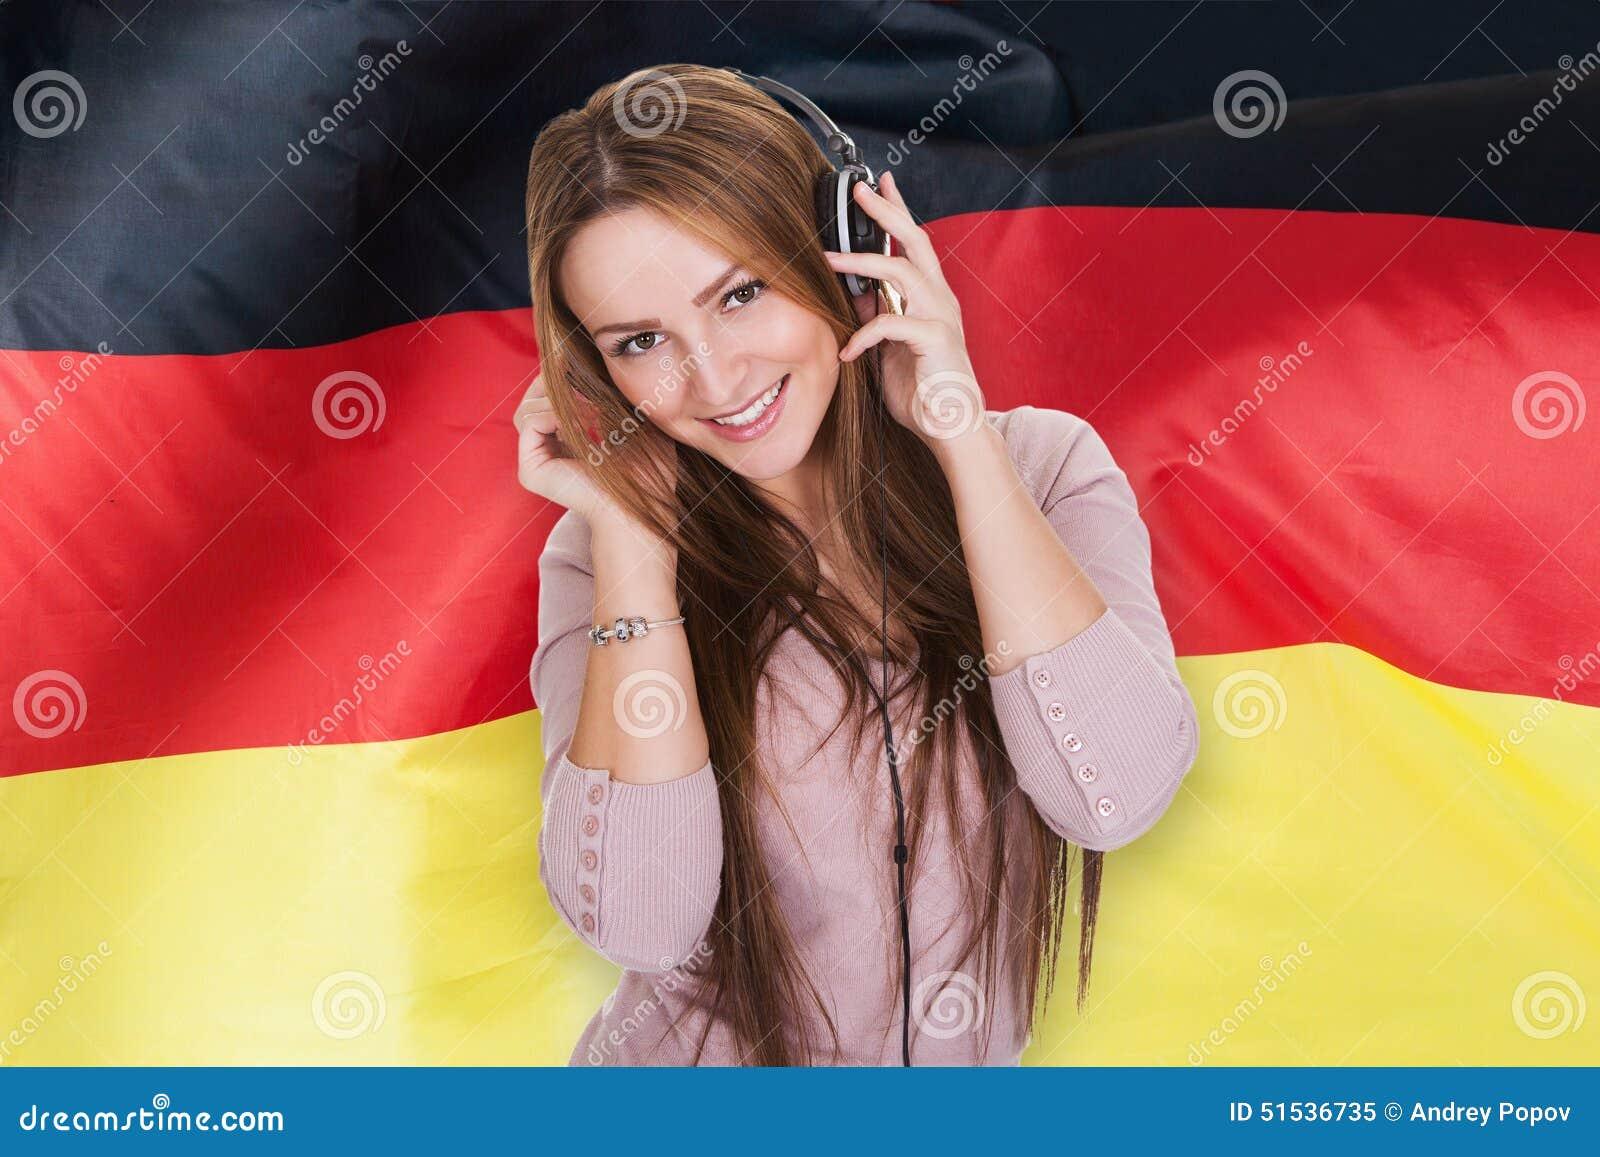 Pimsleur Compact Swiss German CDs - languagequest.com